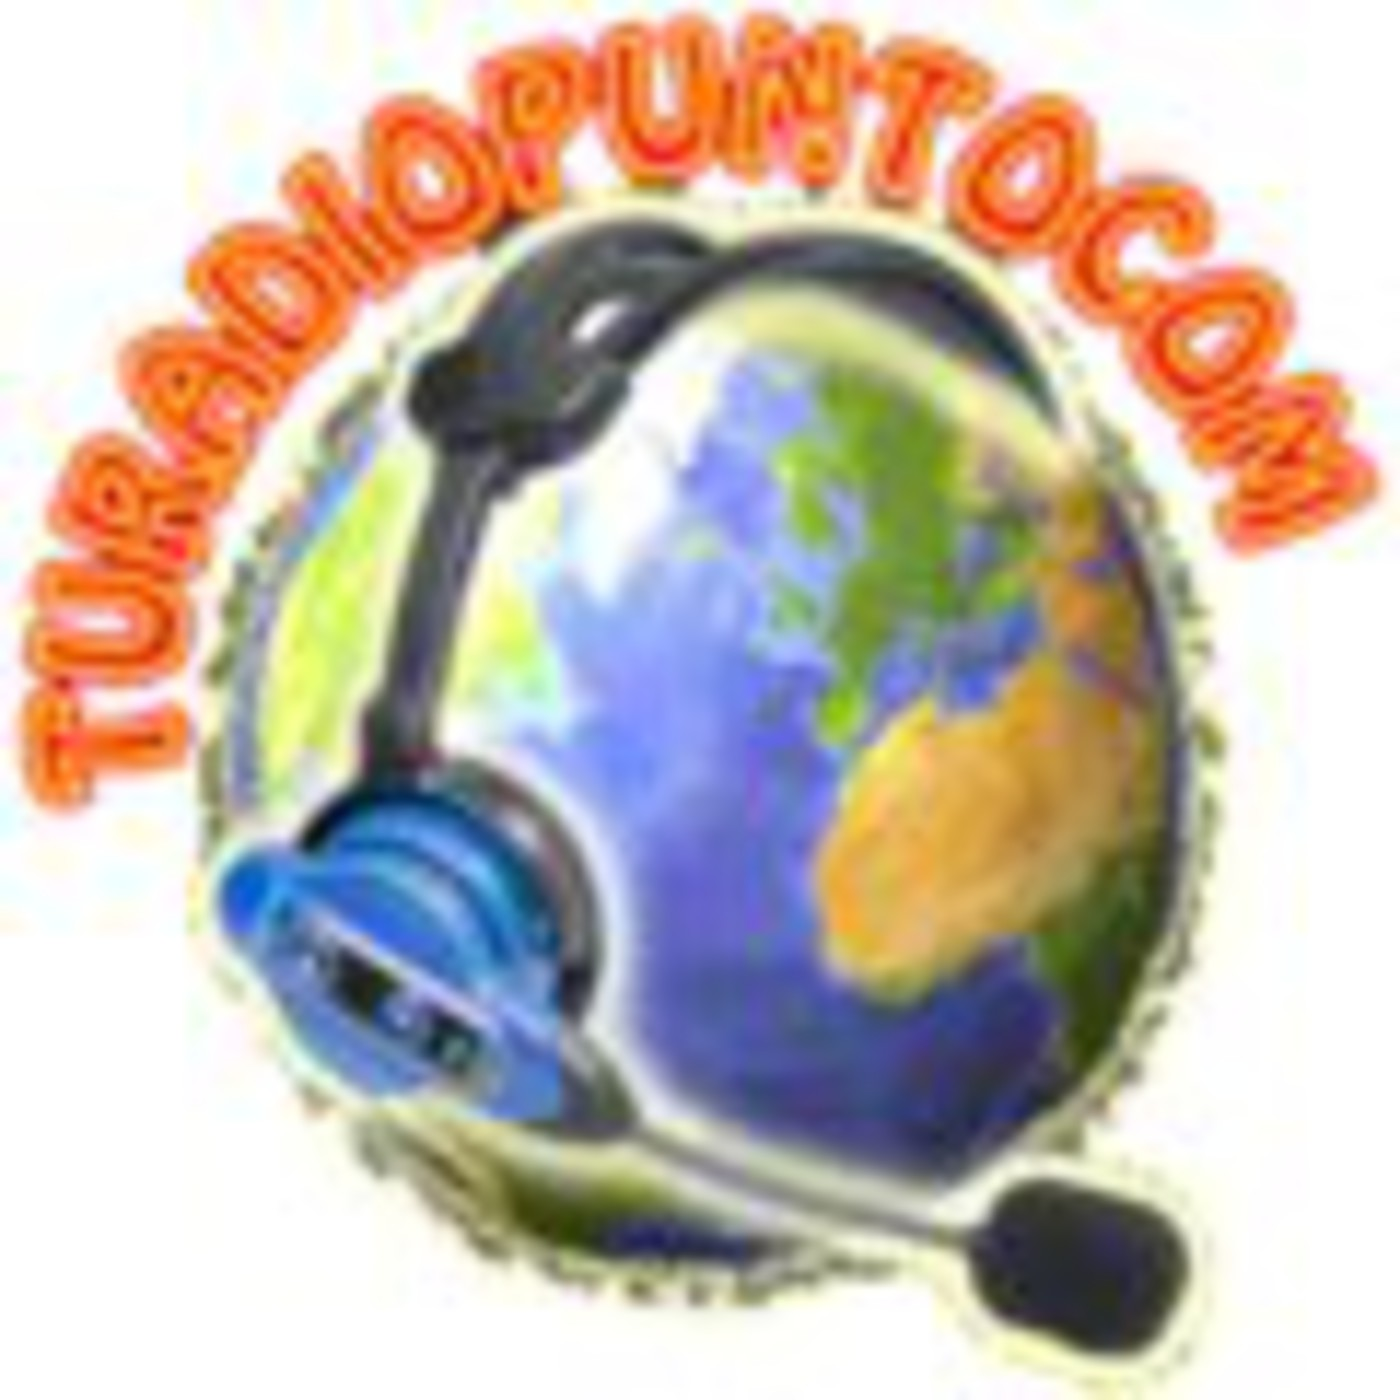 GRUPO TU RADIO PUNTO COM